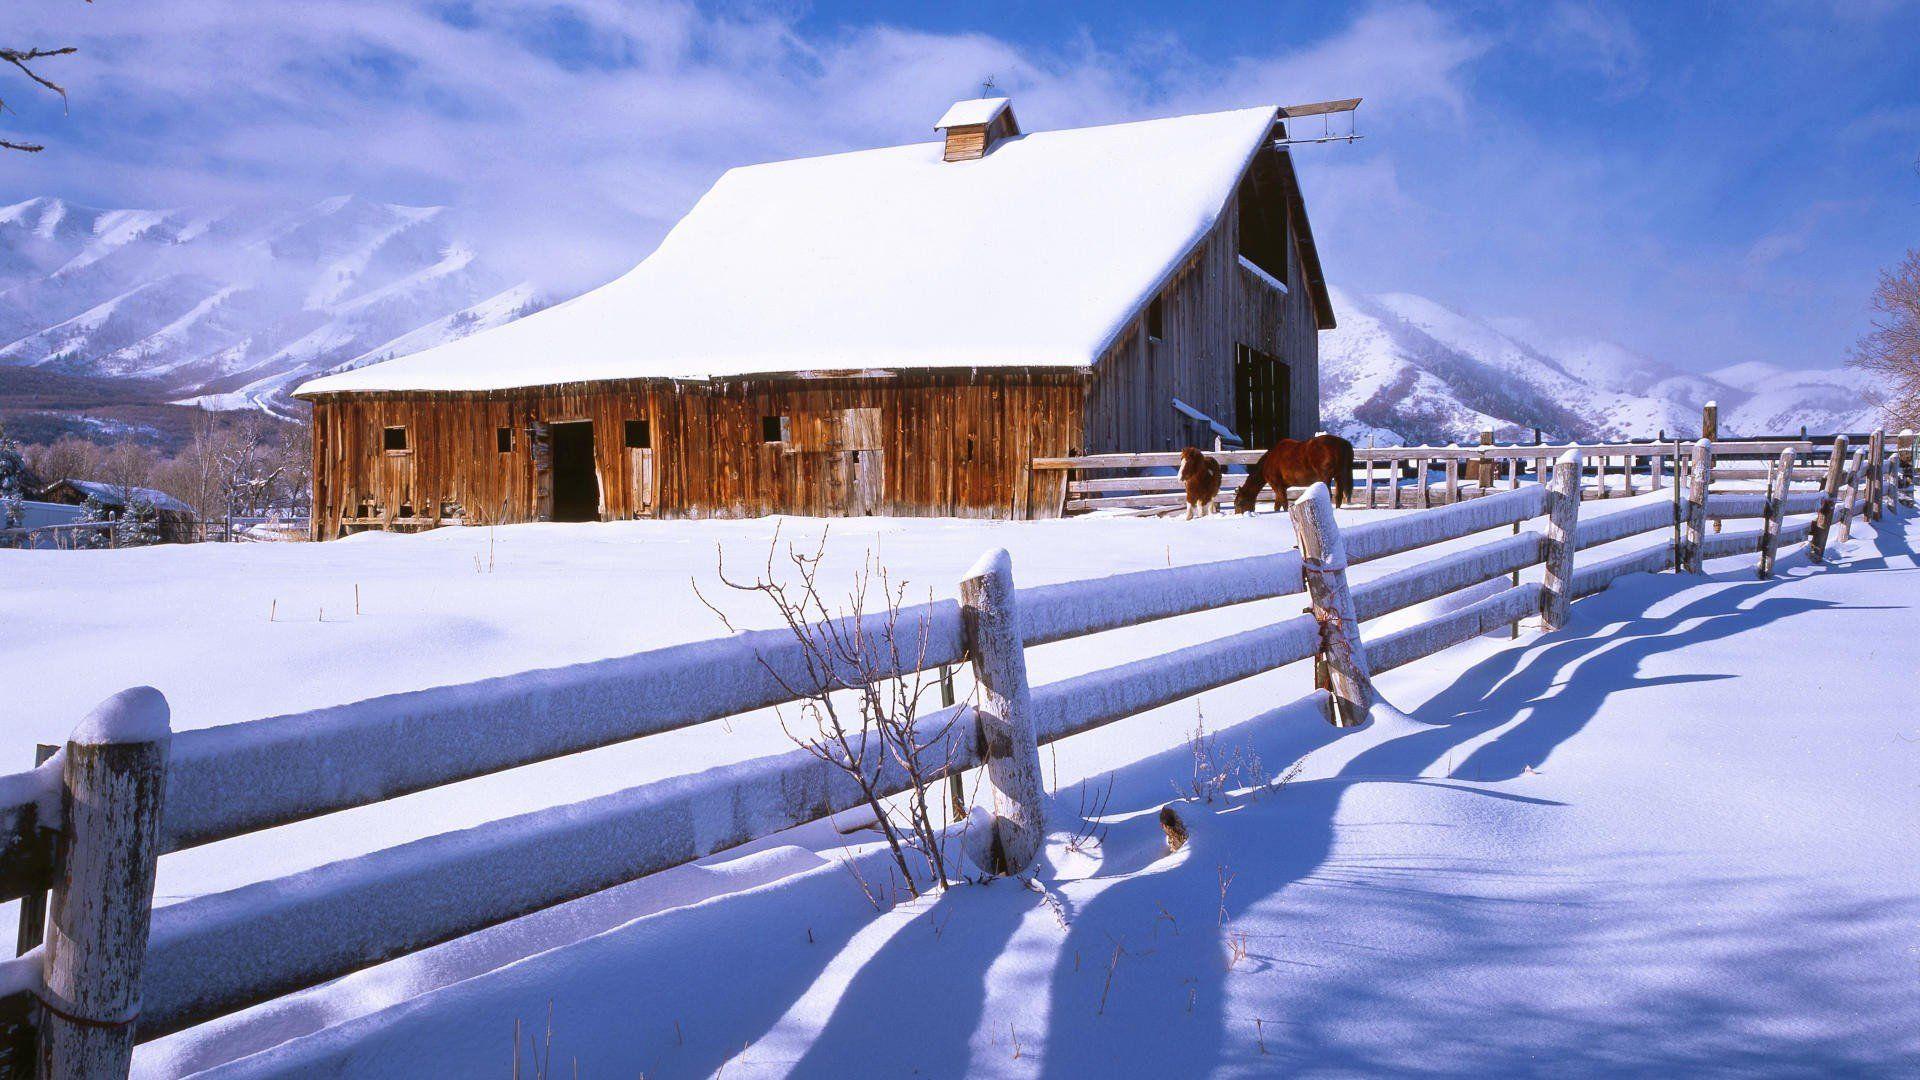 Red Barn Winter Desktop Wallpapers - 4k ...